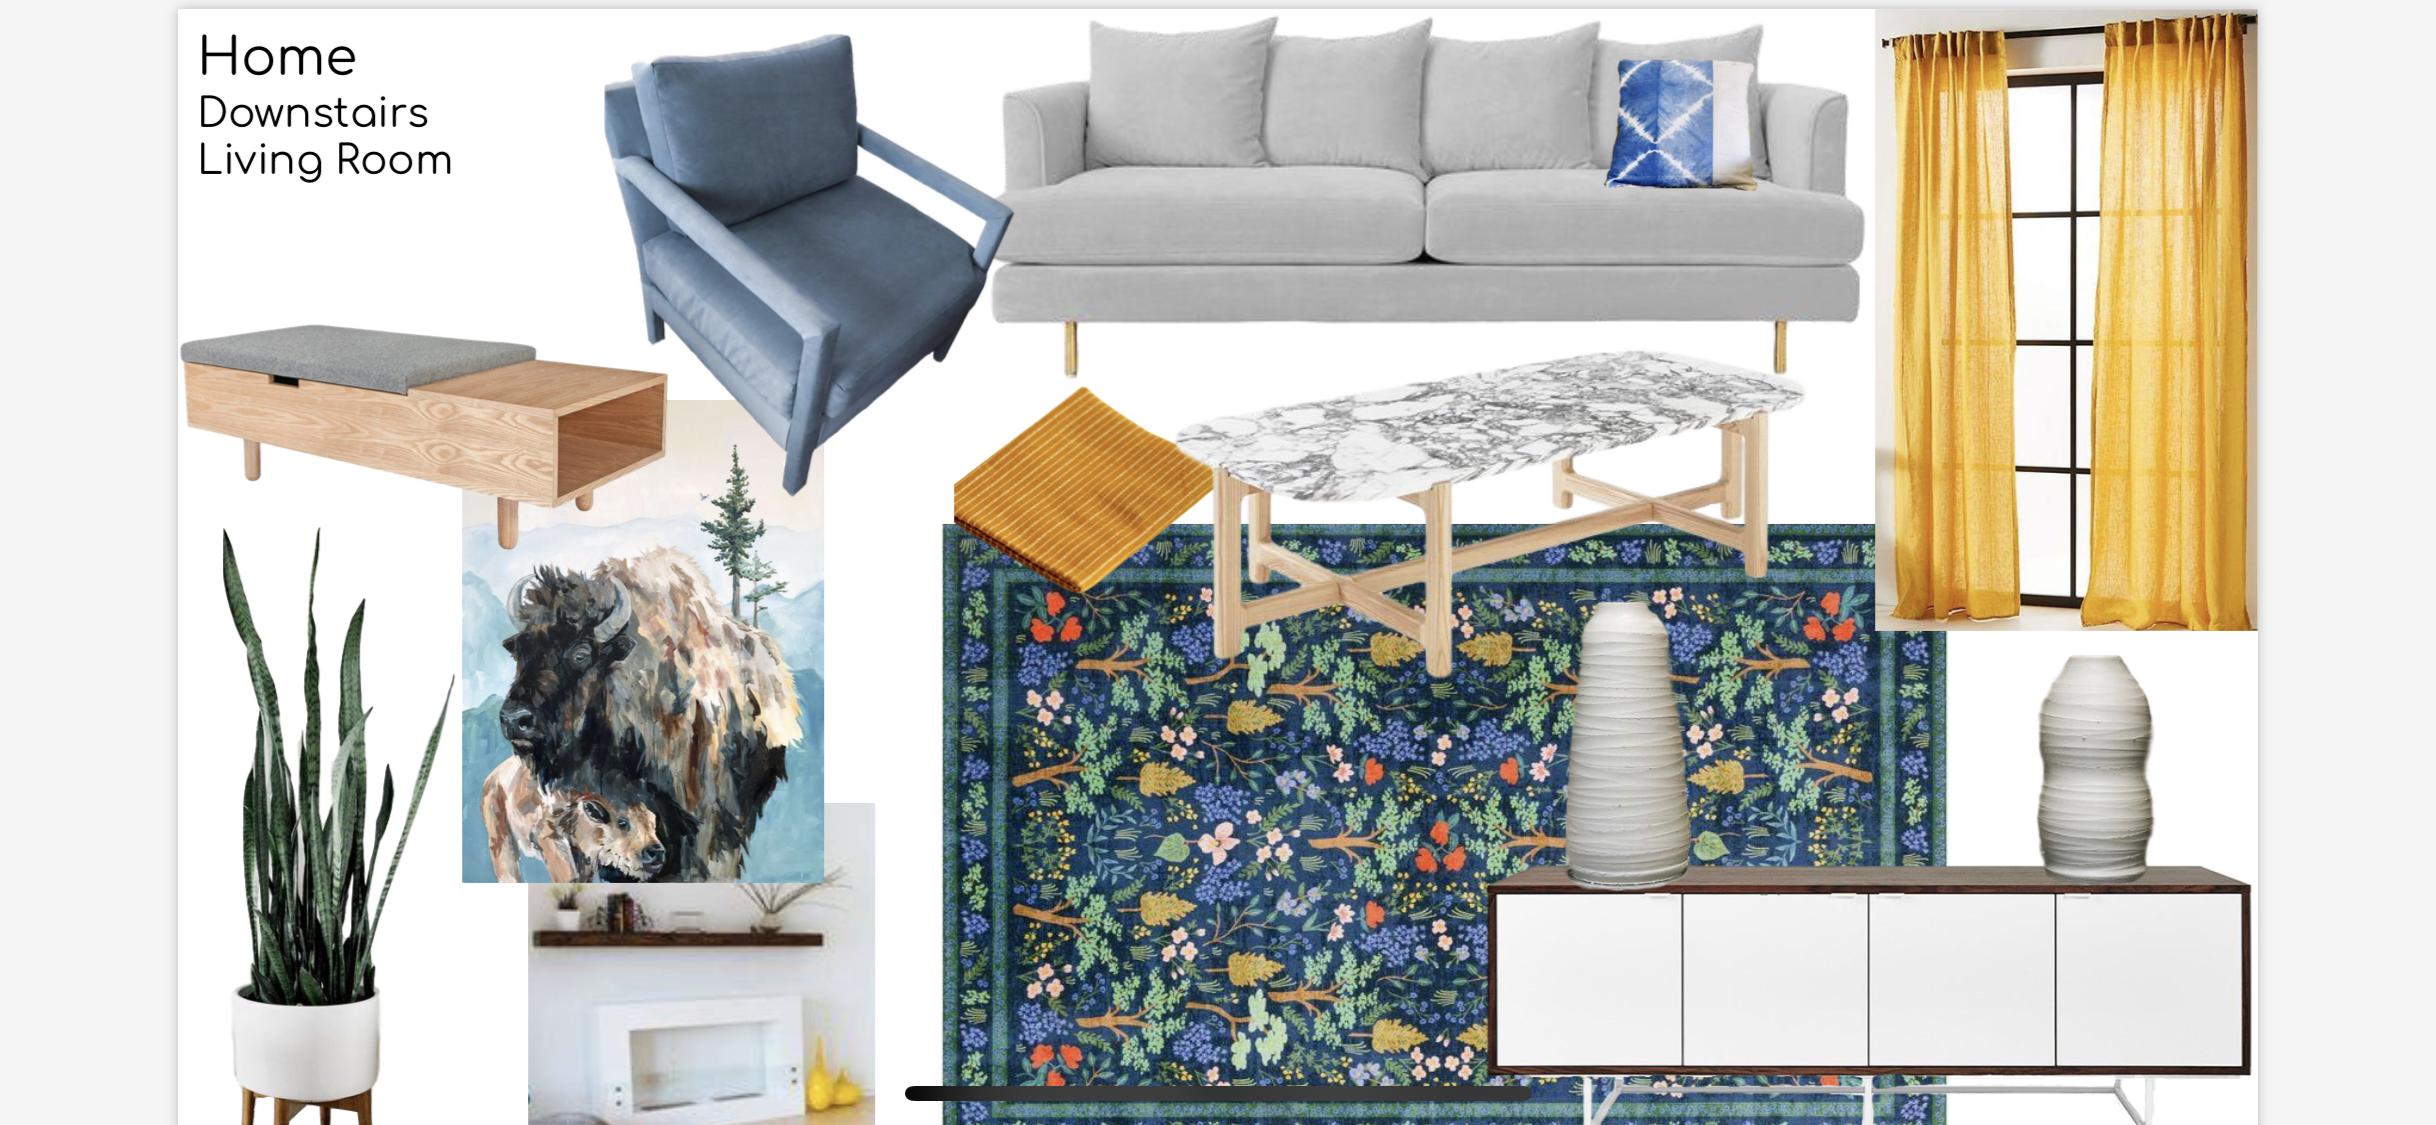 tulsa living room interior design